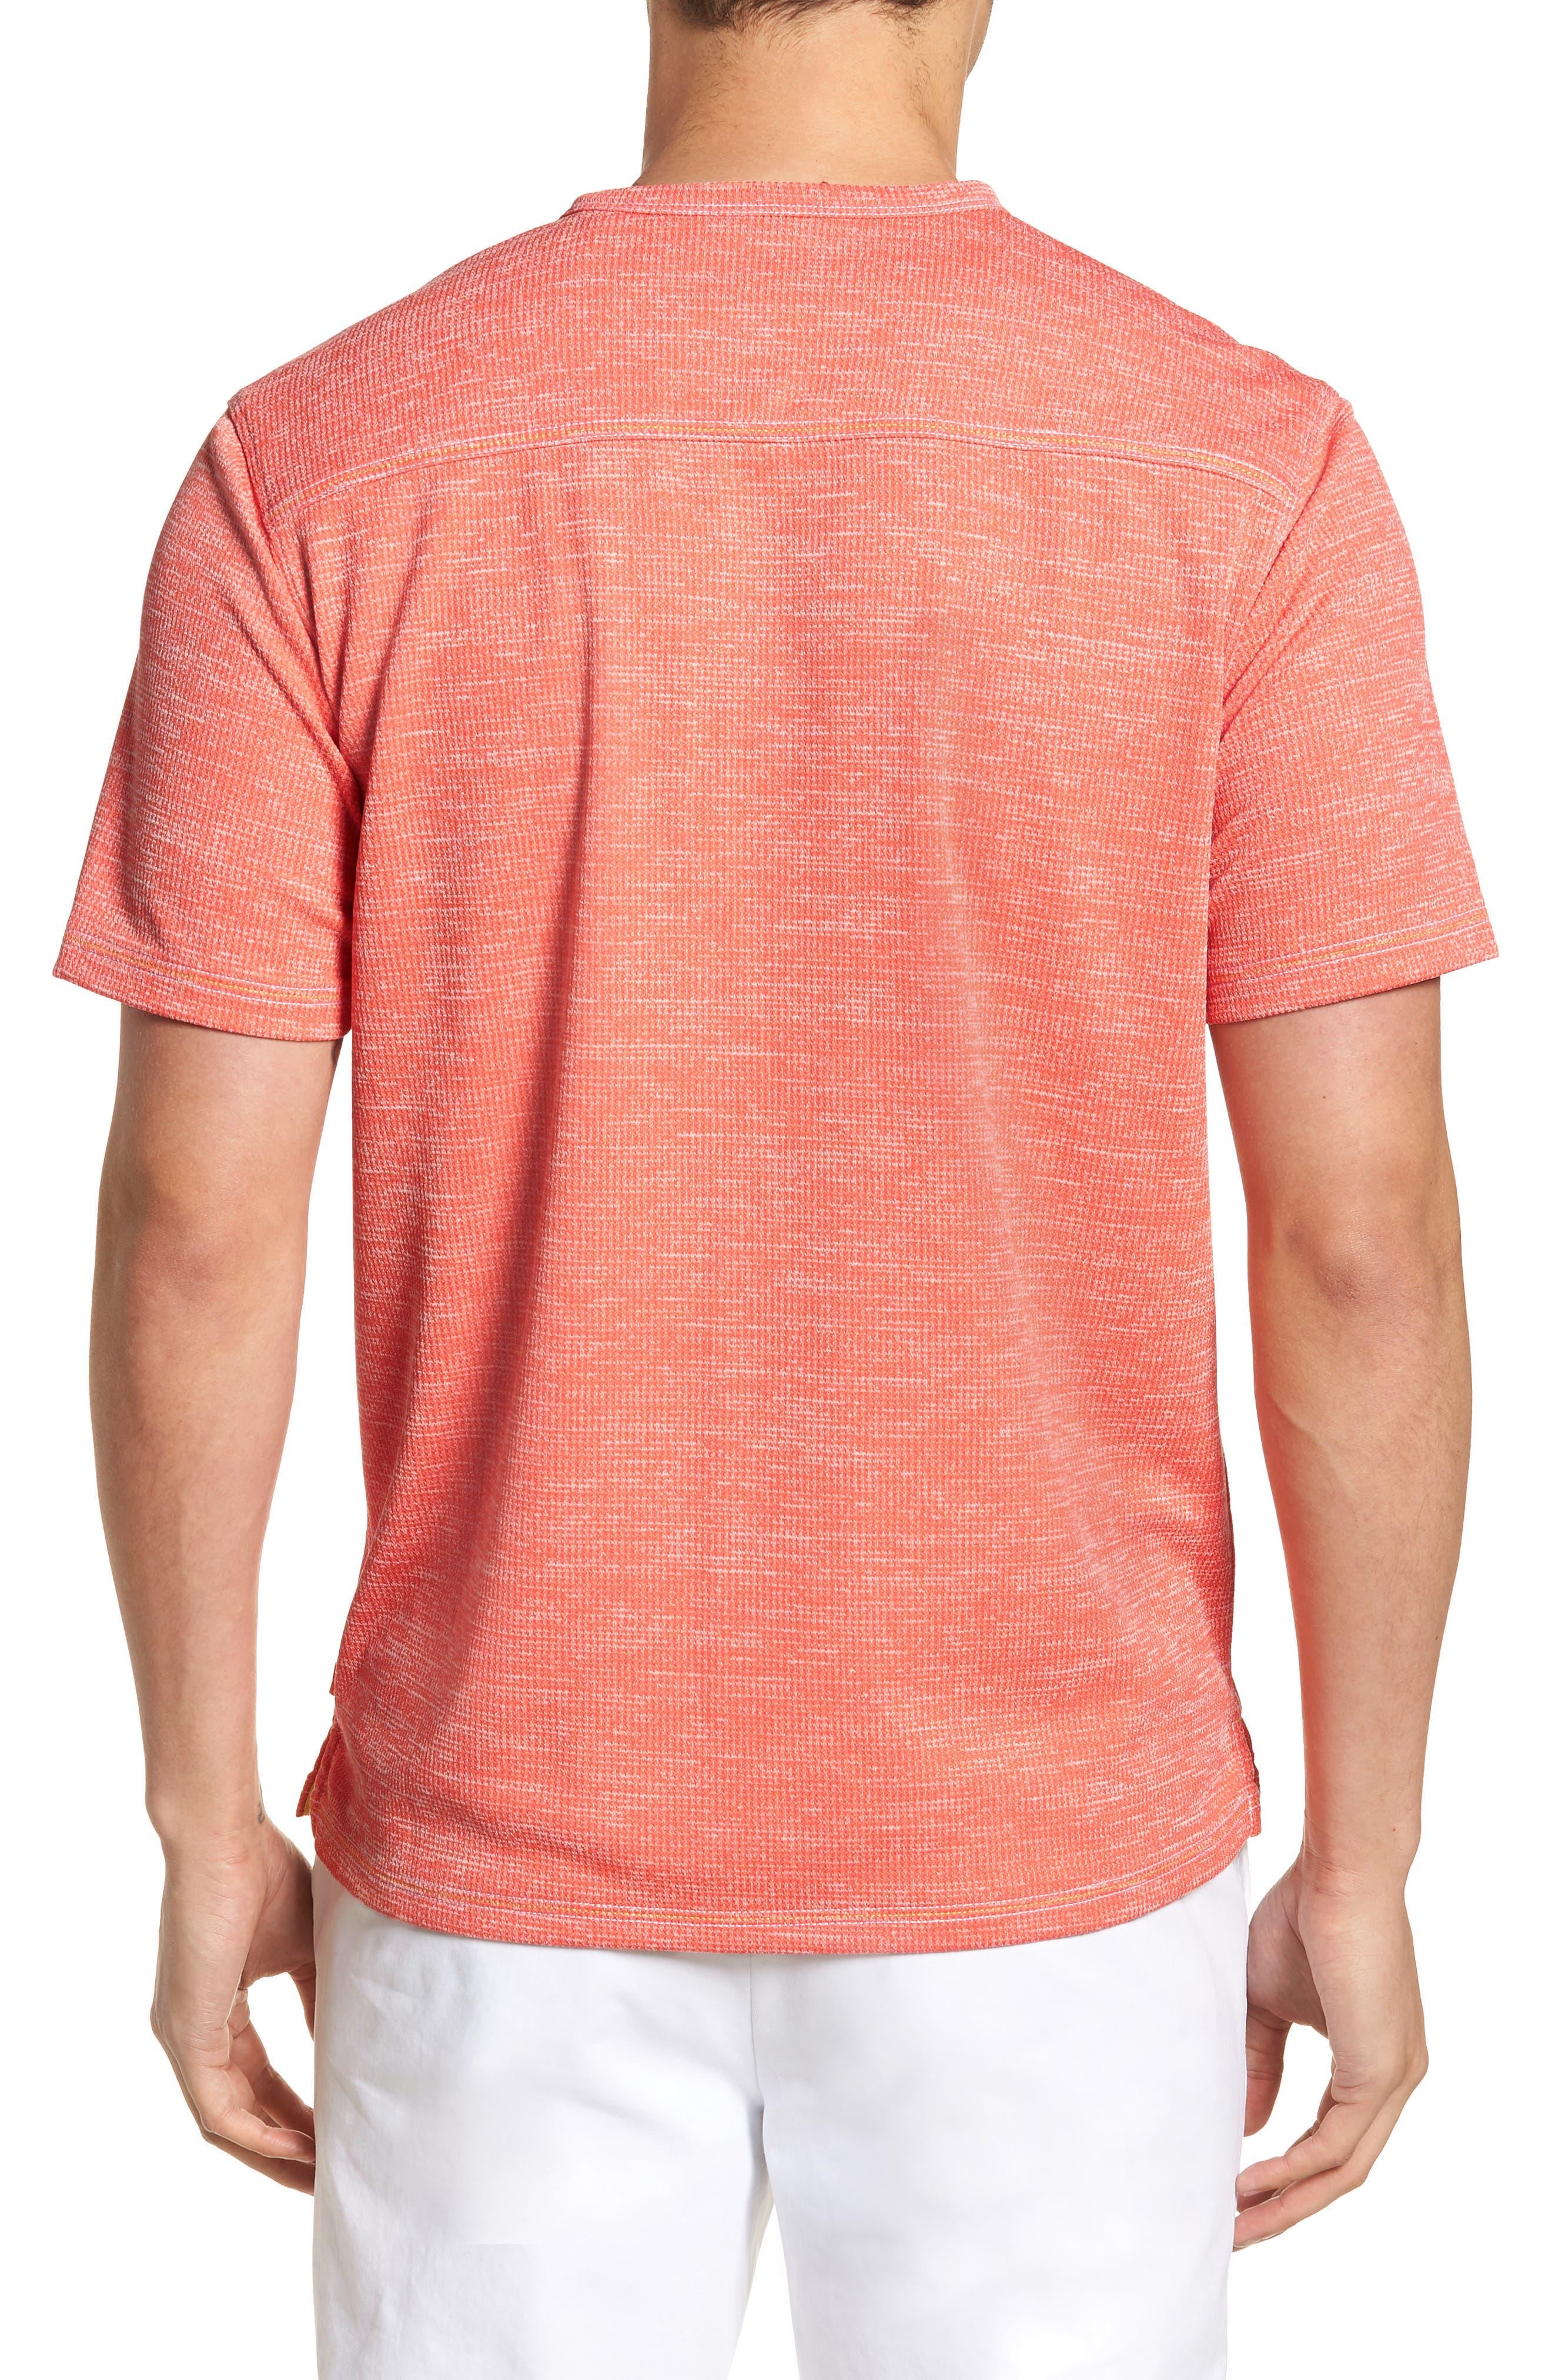 Sand Key V-Neck T-Shirt,                             Alternate thumbnail 16, color,